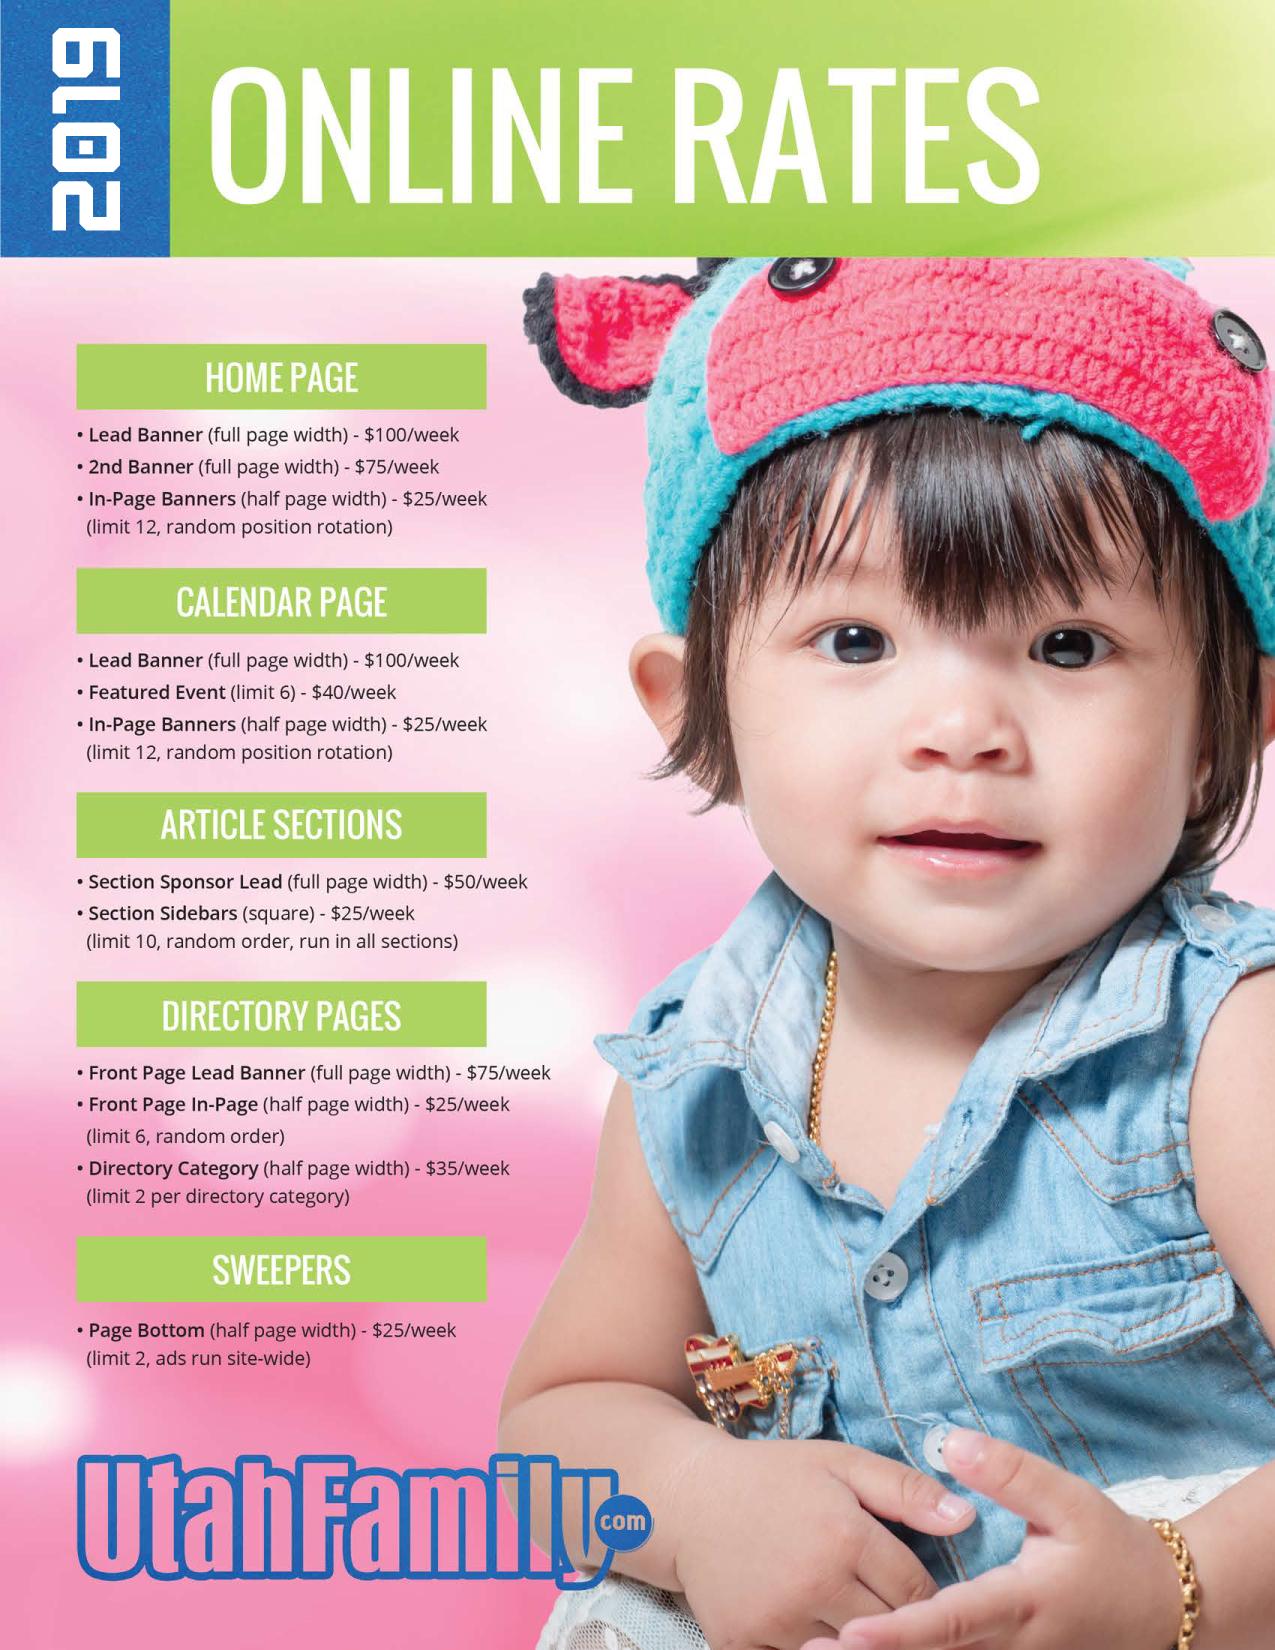 Advertise your Utah business or Utah event with Utah Family